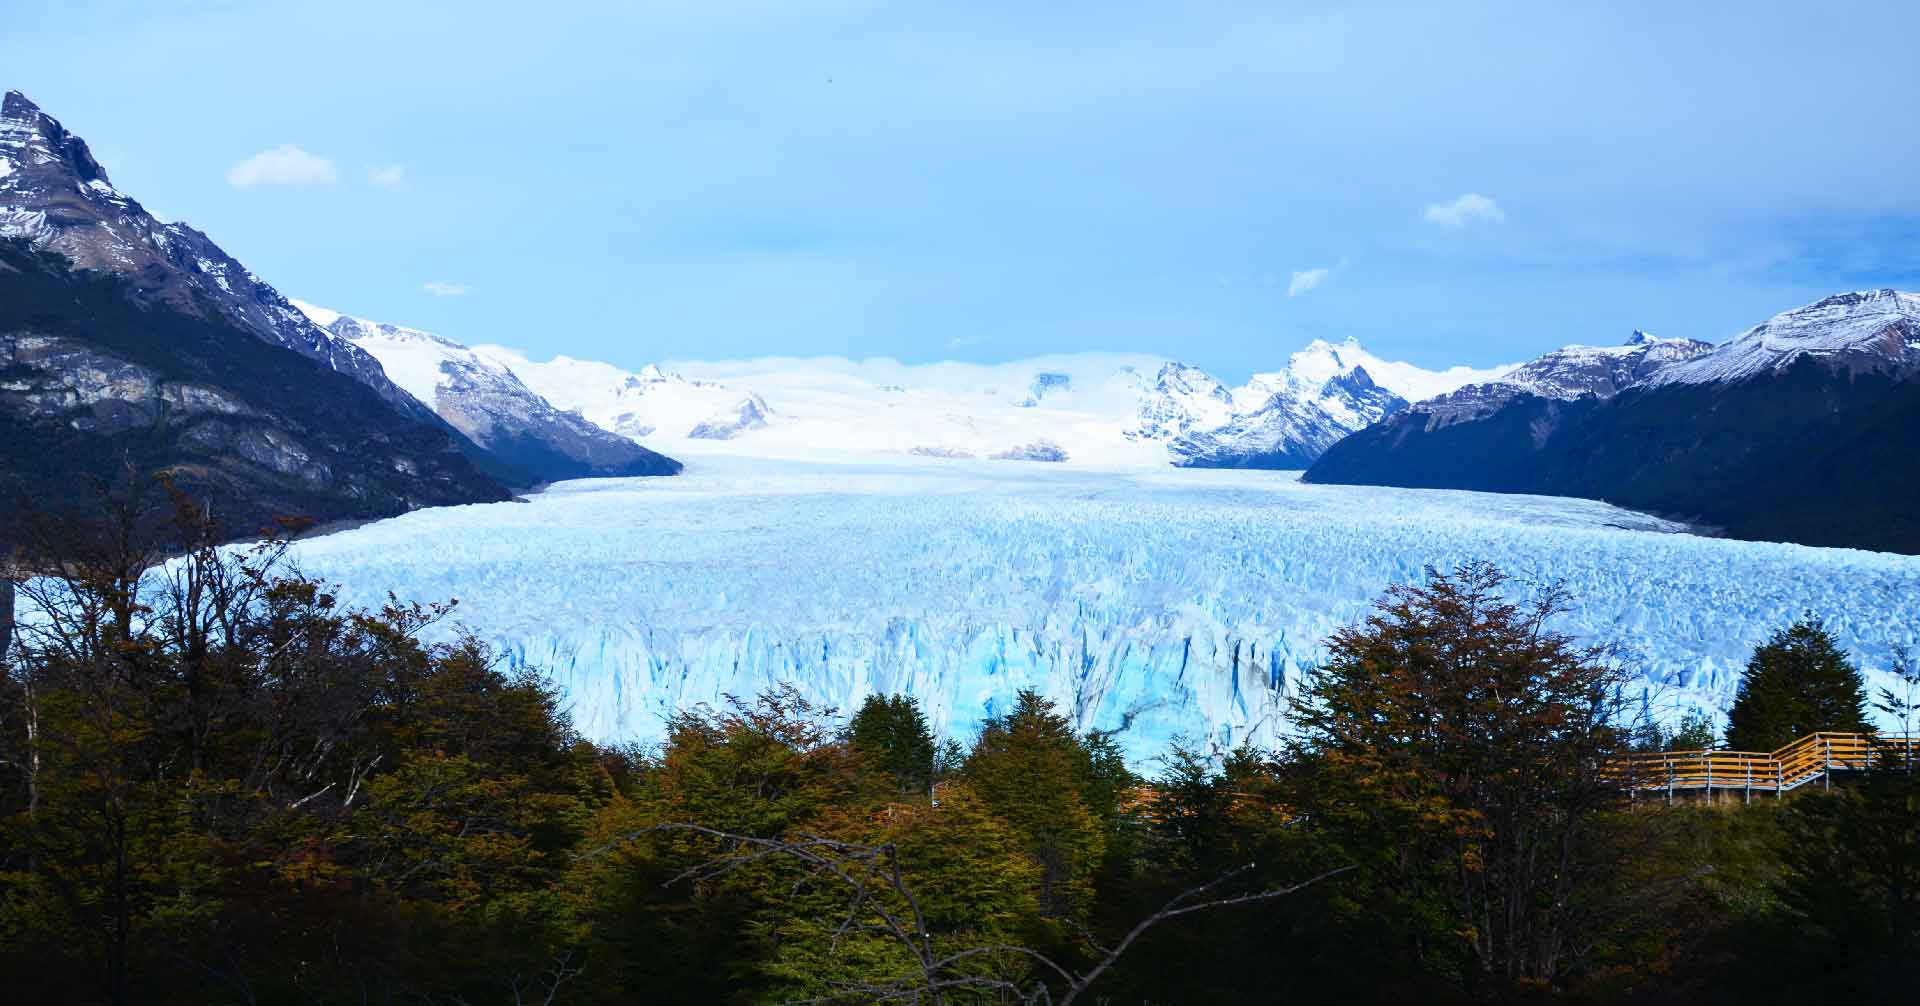 Argentine_Patagonie_Glacier-Perito-Moreno-c-Gaelle-Montcharmont-5-web